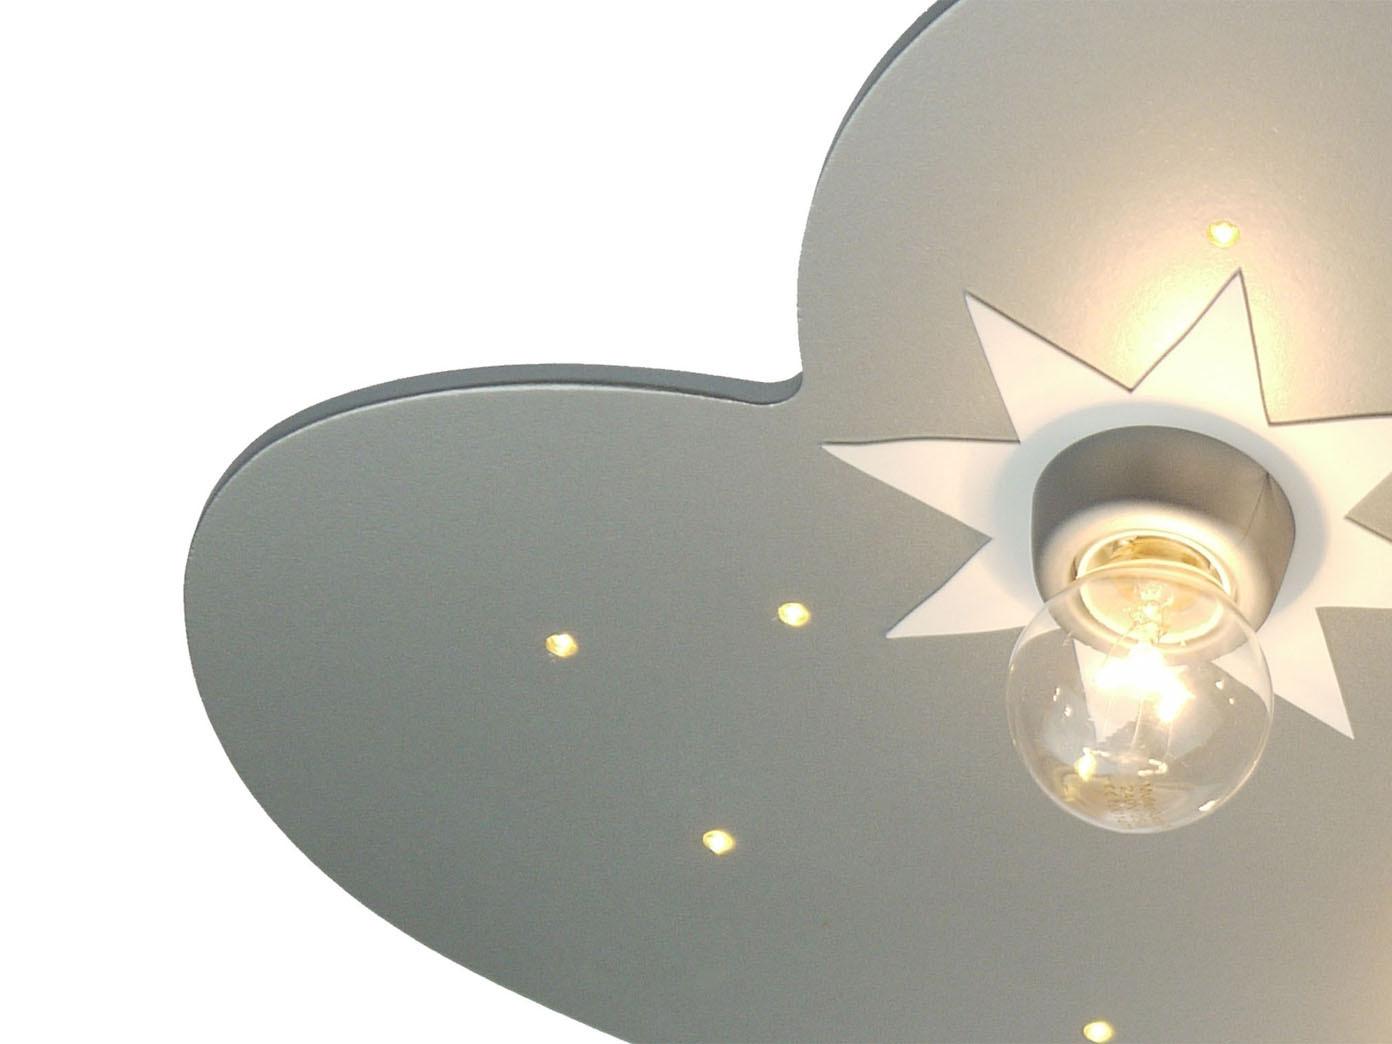 LED Lampe Kinderzimmer LED Sternenhimmel Schlummerlicht Wolkenlampe  Kinderlicht